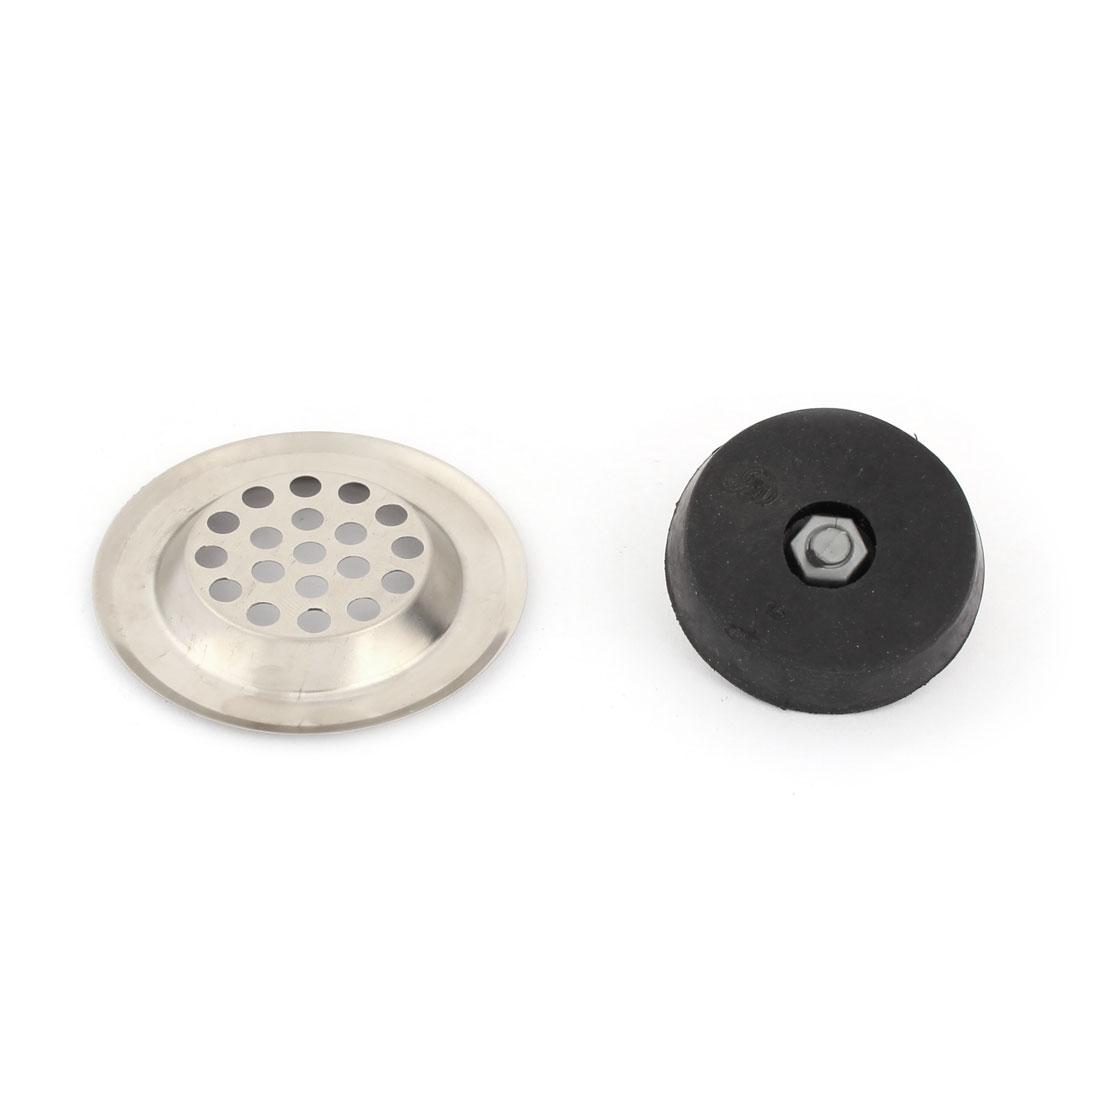 Kitchen Bathroom Stainless Steel Sink Strainer Disposal Basin Drain - image 2 of 3